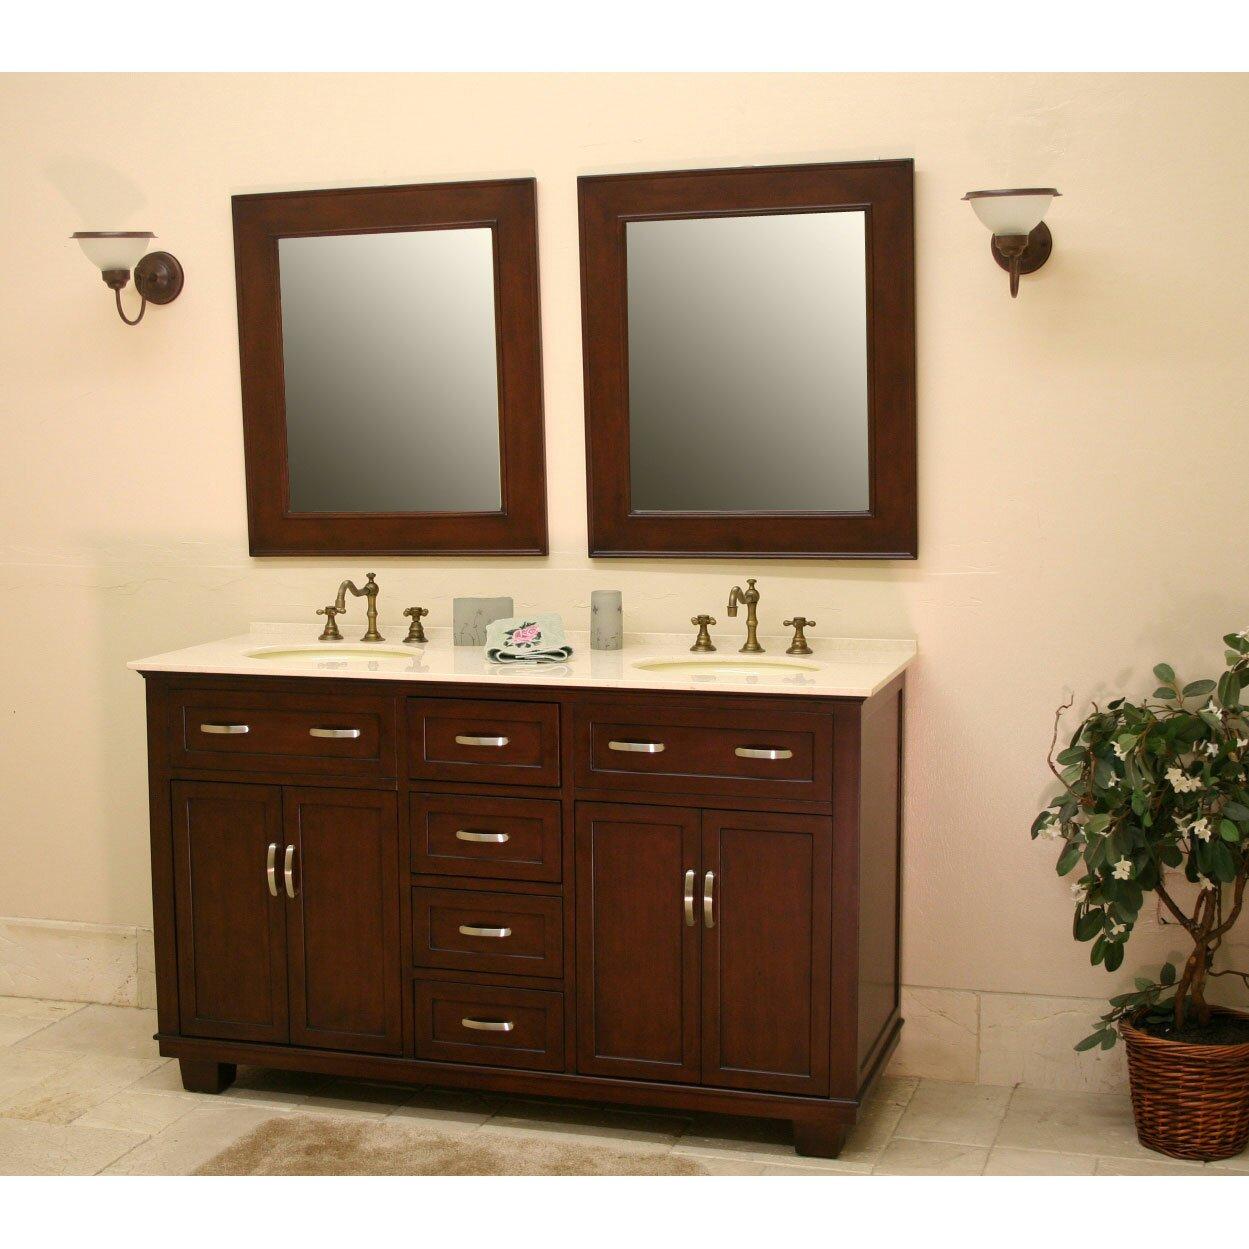 Double bathroom vanity - Bolton 60 Double Bathroom Vanity Set